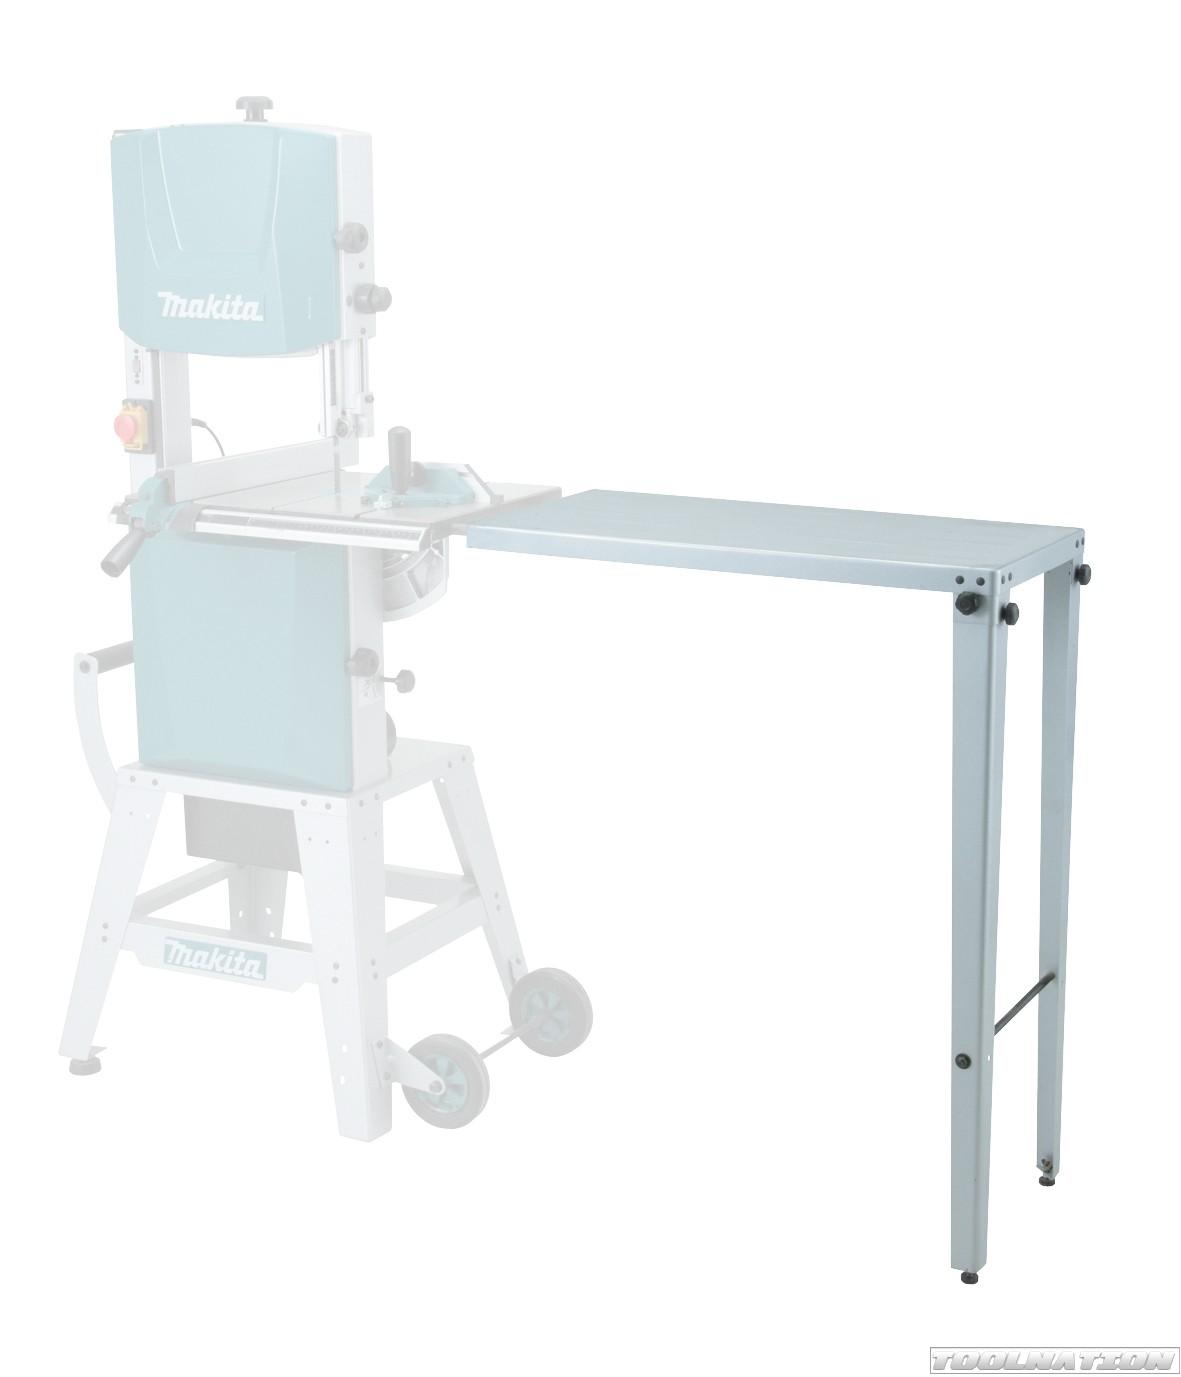 Extensión de mesa makita JM21000300